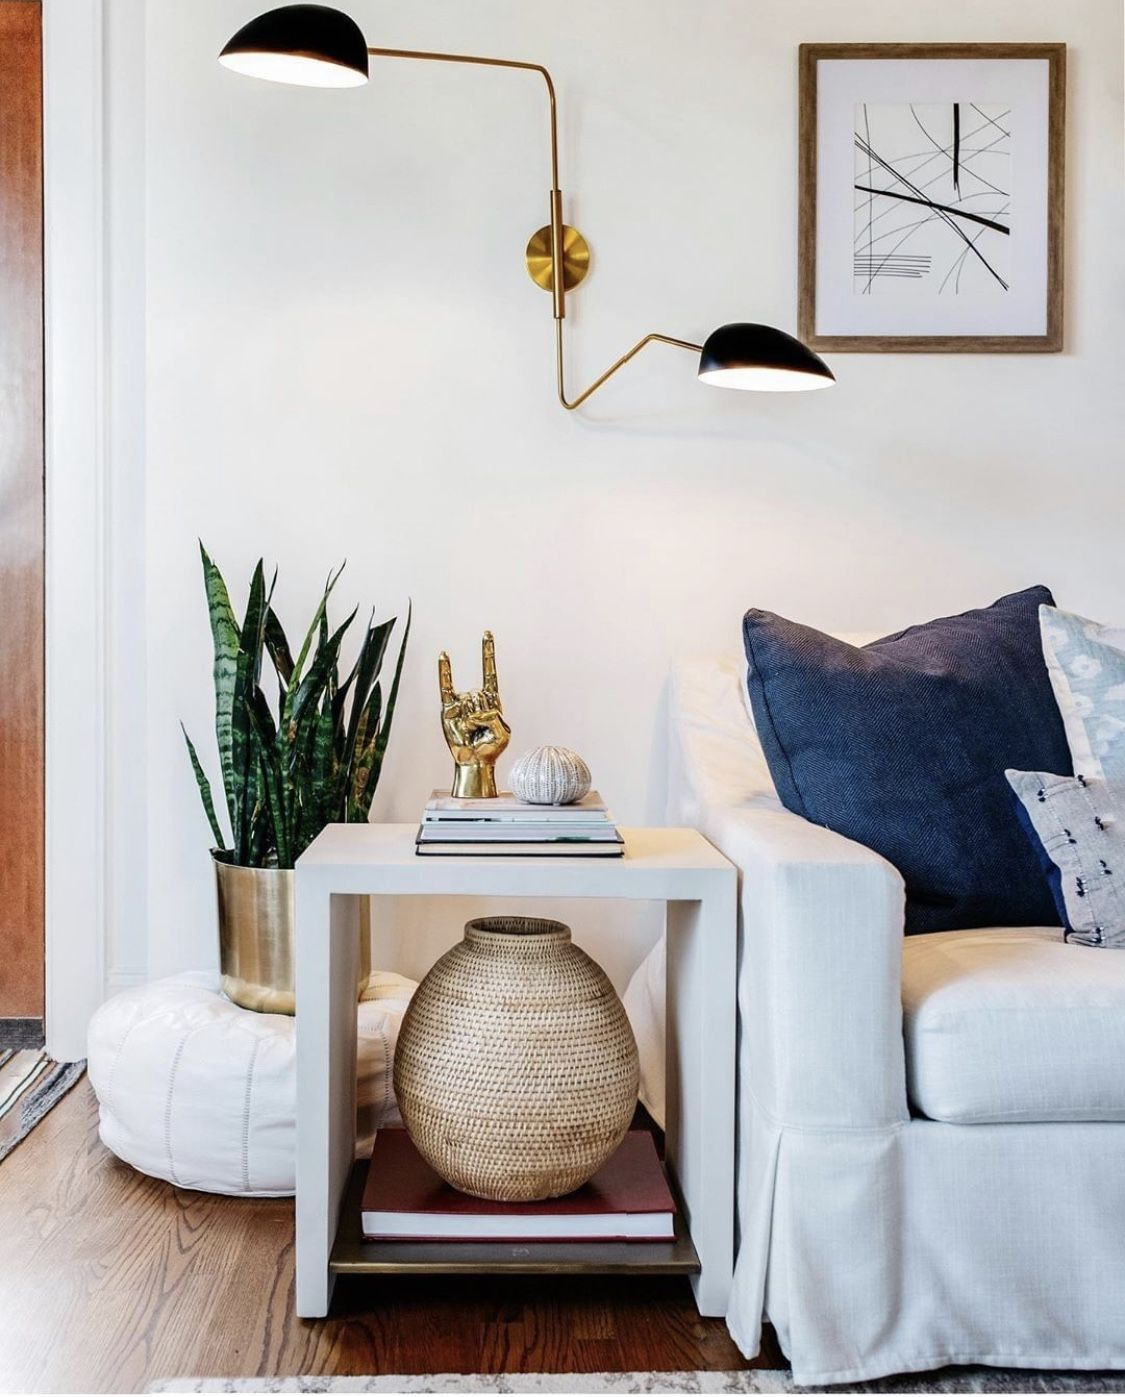 Living Room Decor Living Room Sconces Behind Couch Sconces Living Room Couches Living Room